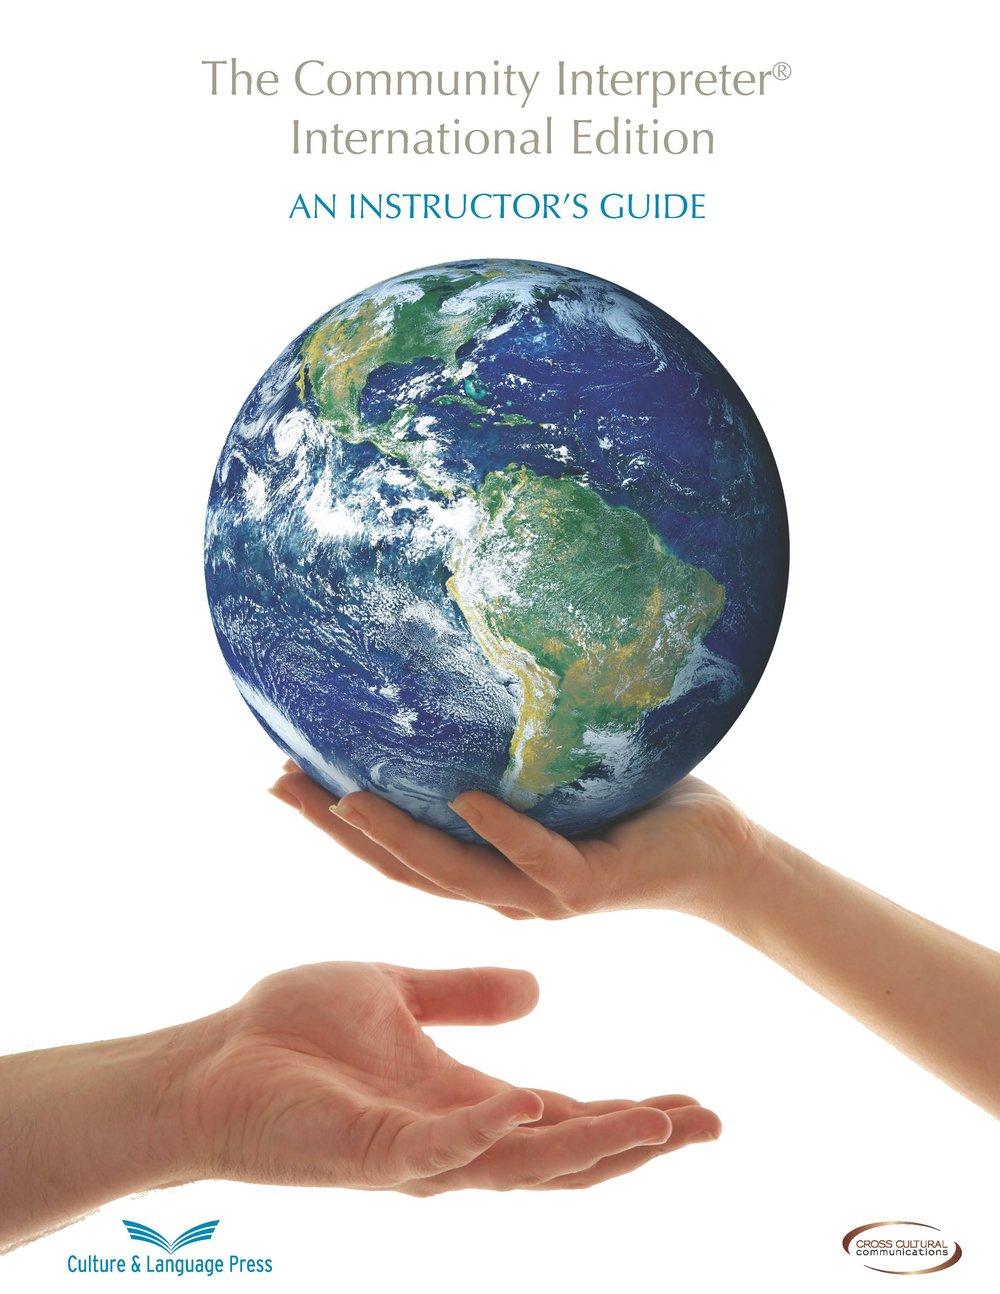 TCII Instructor's Guide thumbnail.jpg